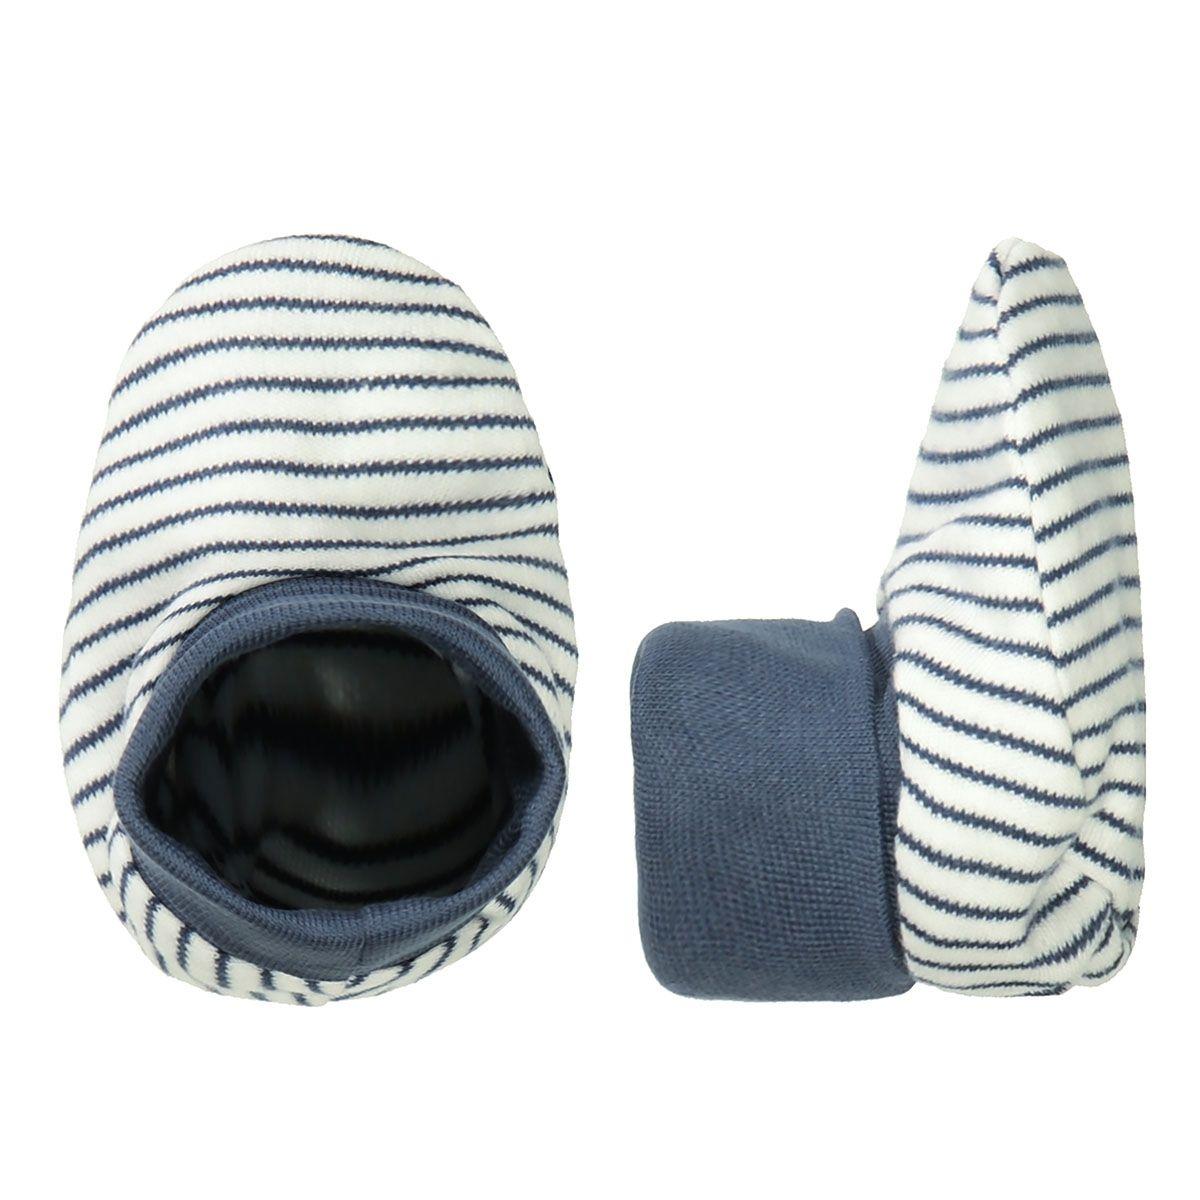 ORGANIC COTTON Baby Schuhe - Offwhite Streifen